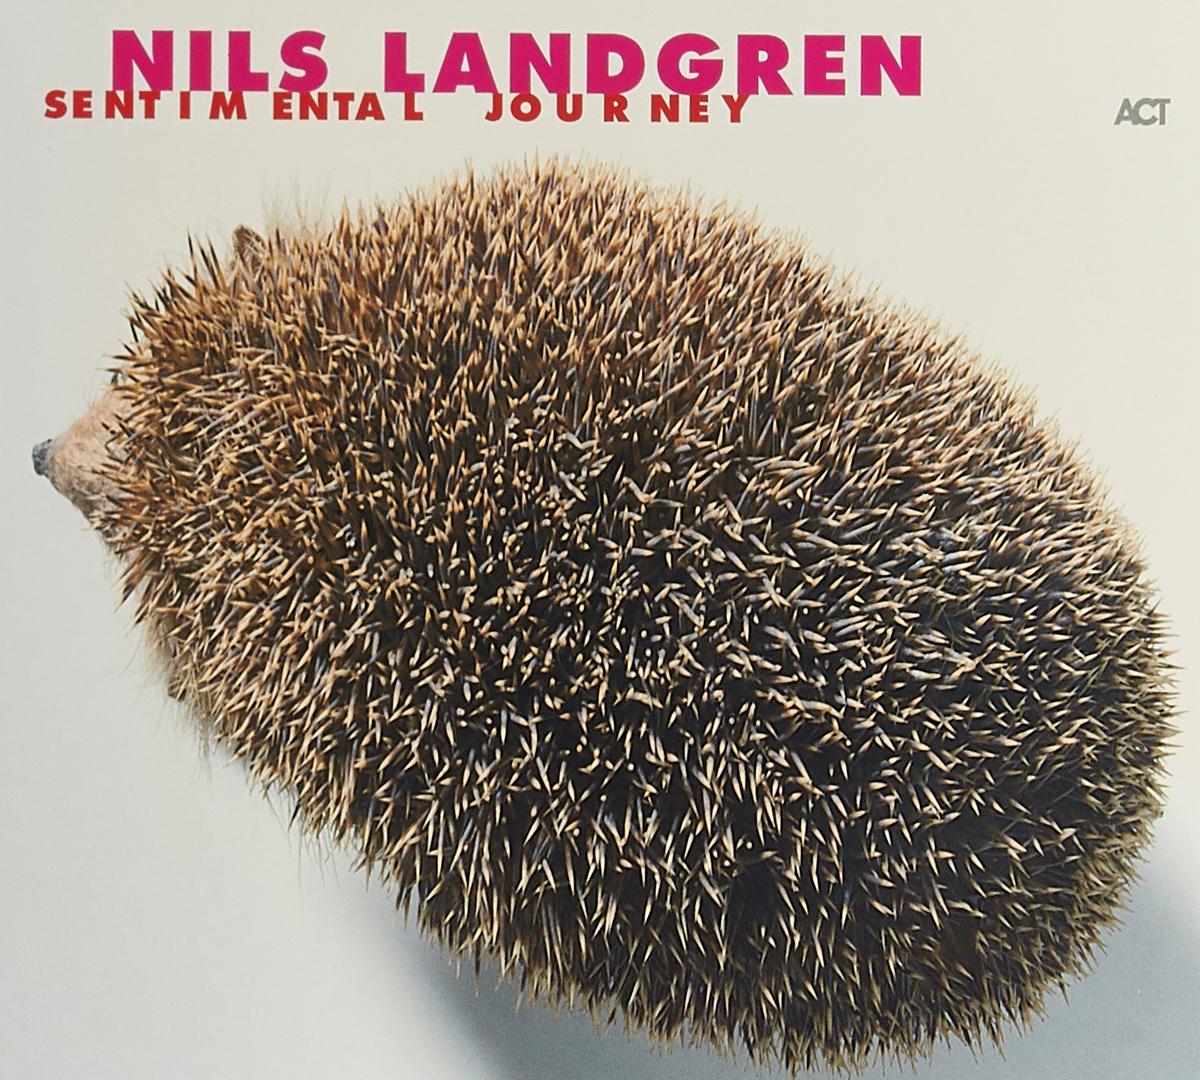 Нилс Ландгрен Nils Landgren. Sentimental Journey бетти нилс roheliste silmadega tüdruk